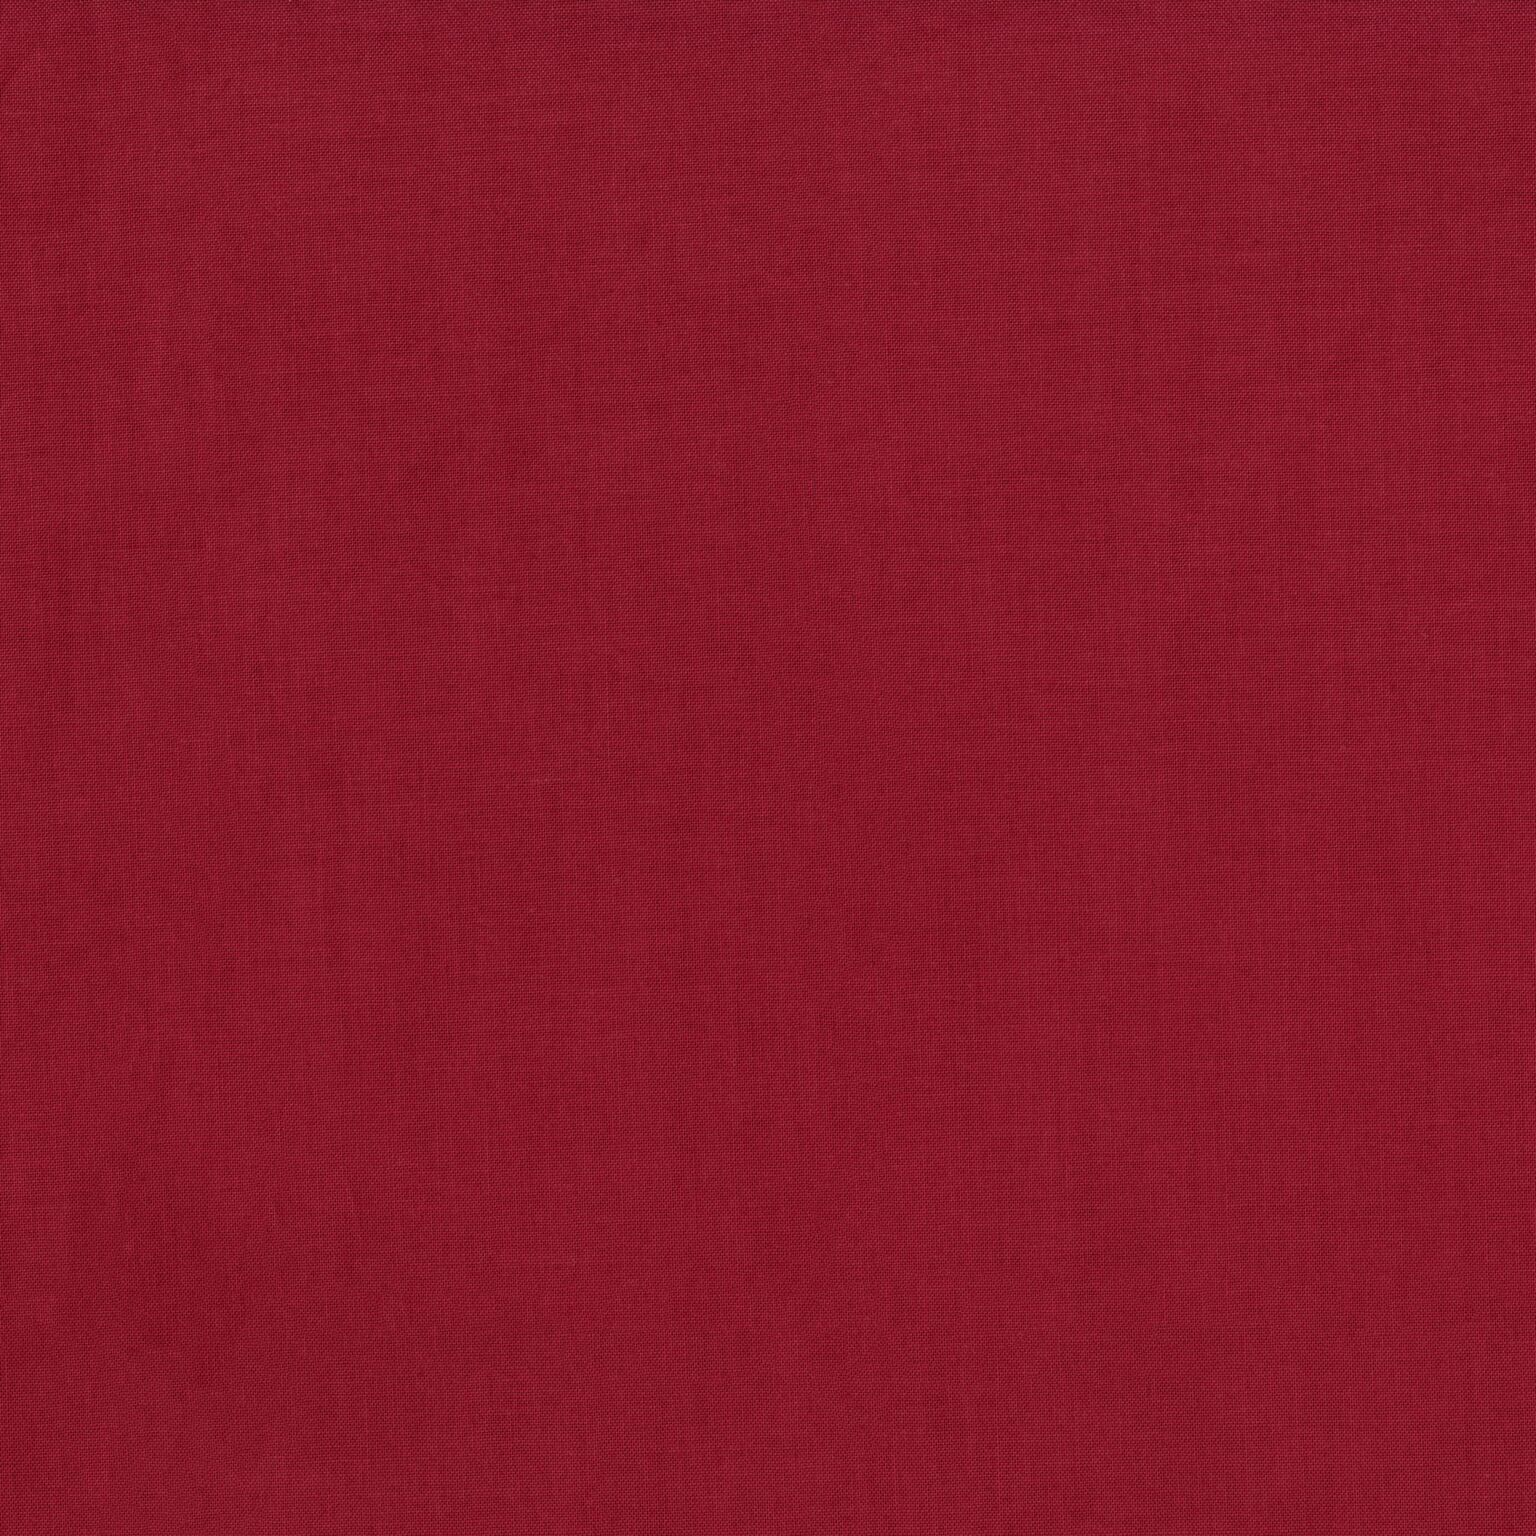 1 3/4 YARDS- Cotton Supreme Solids- Rosewood- RJR Fabrics- 386